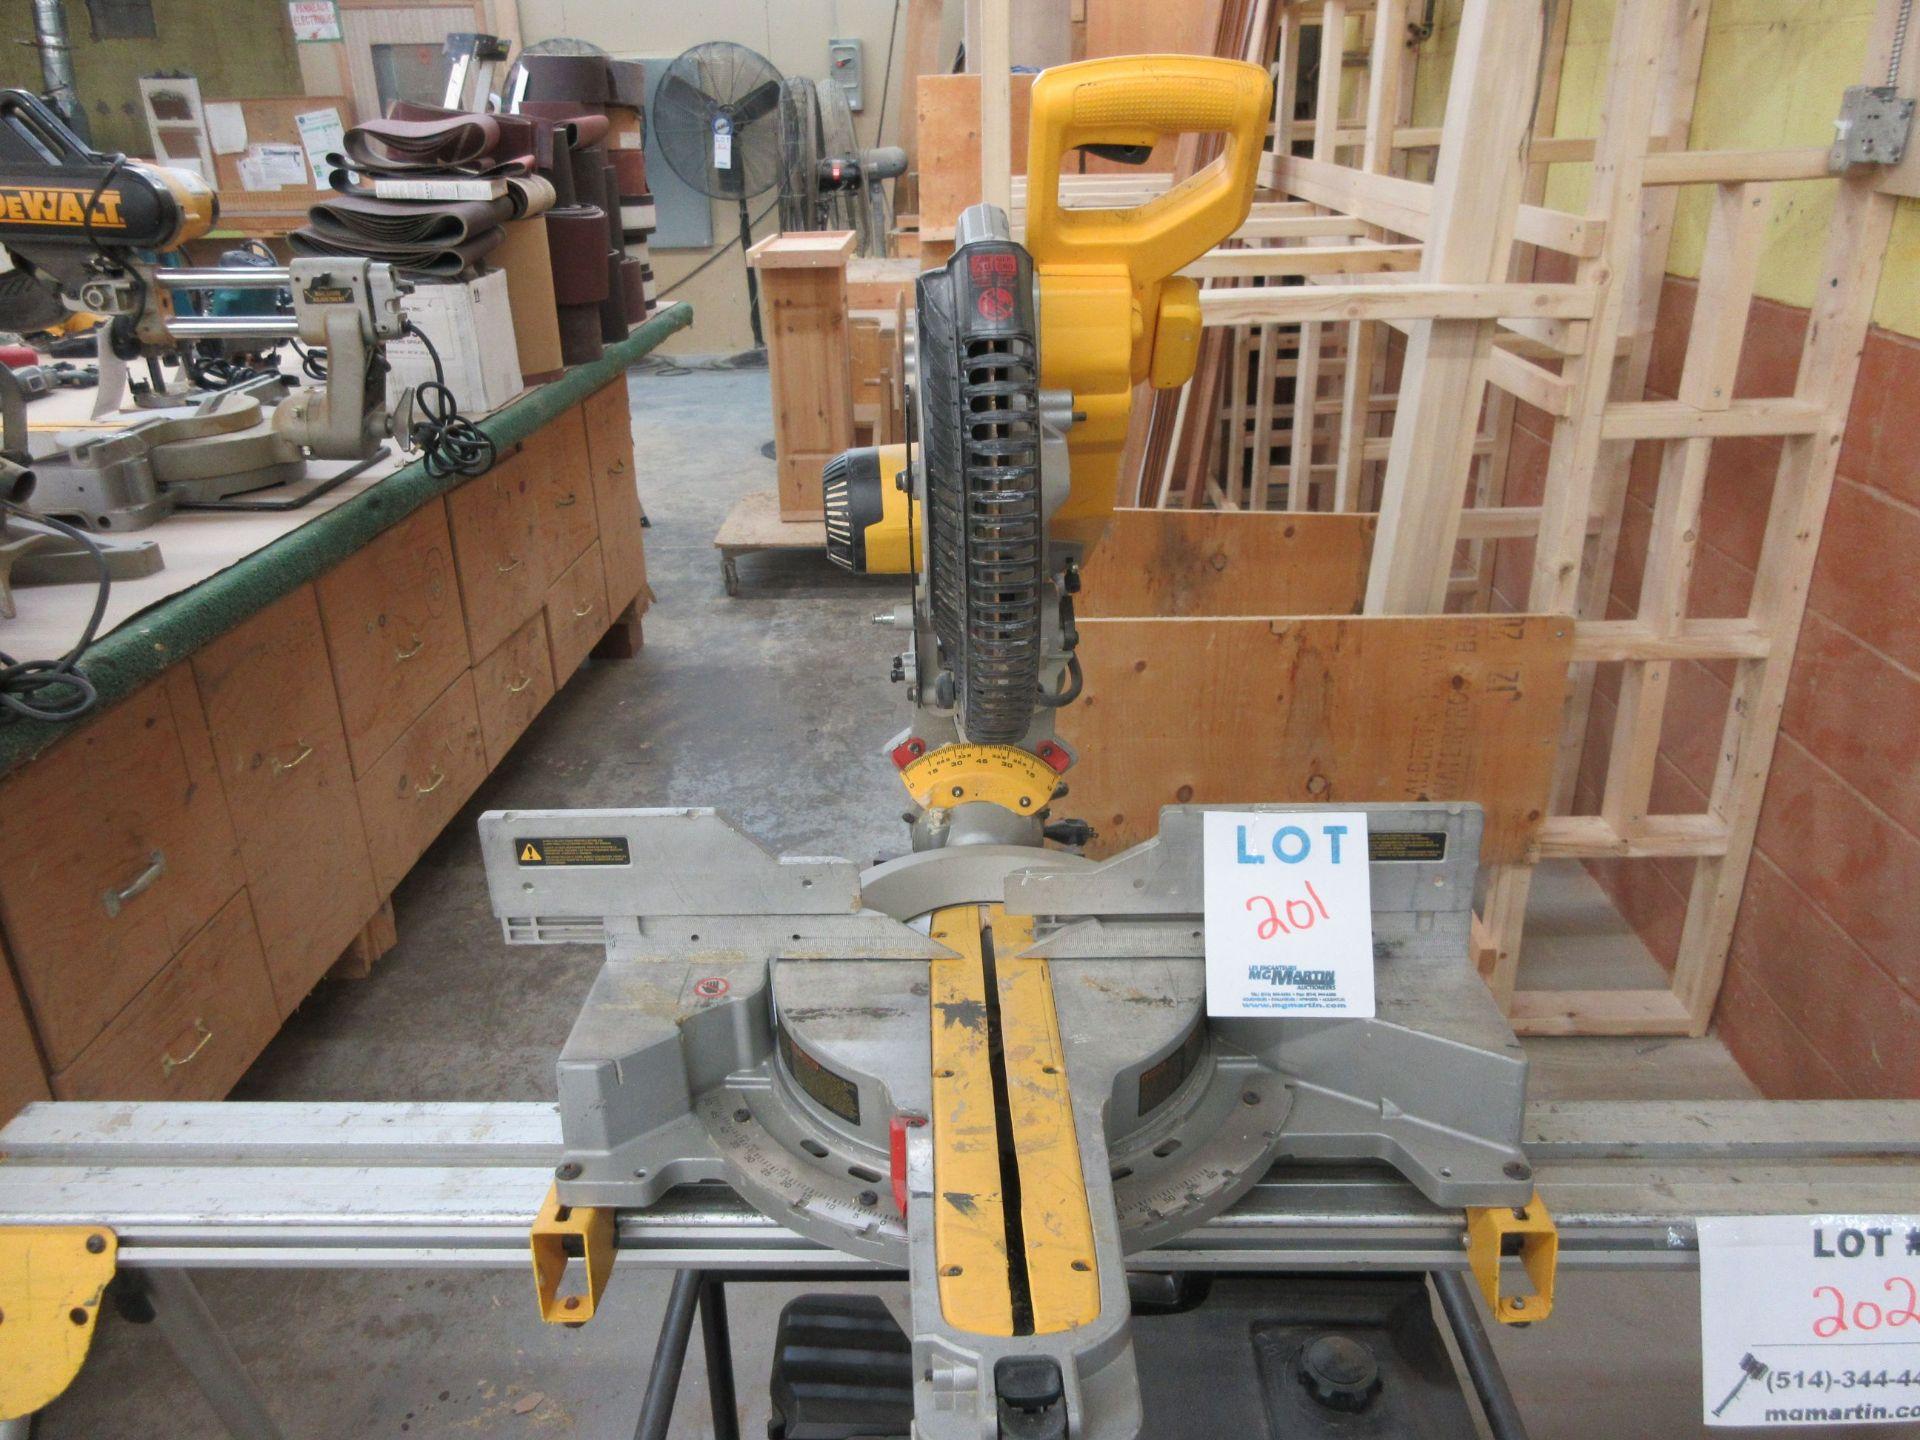 Lot 201 - DEWALT miter saw Mod: DWS 780